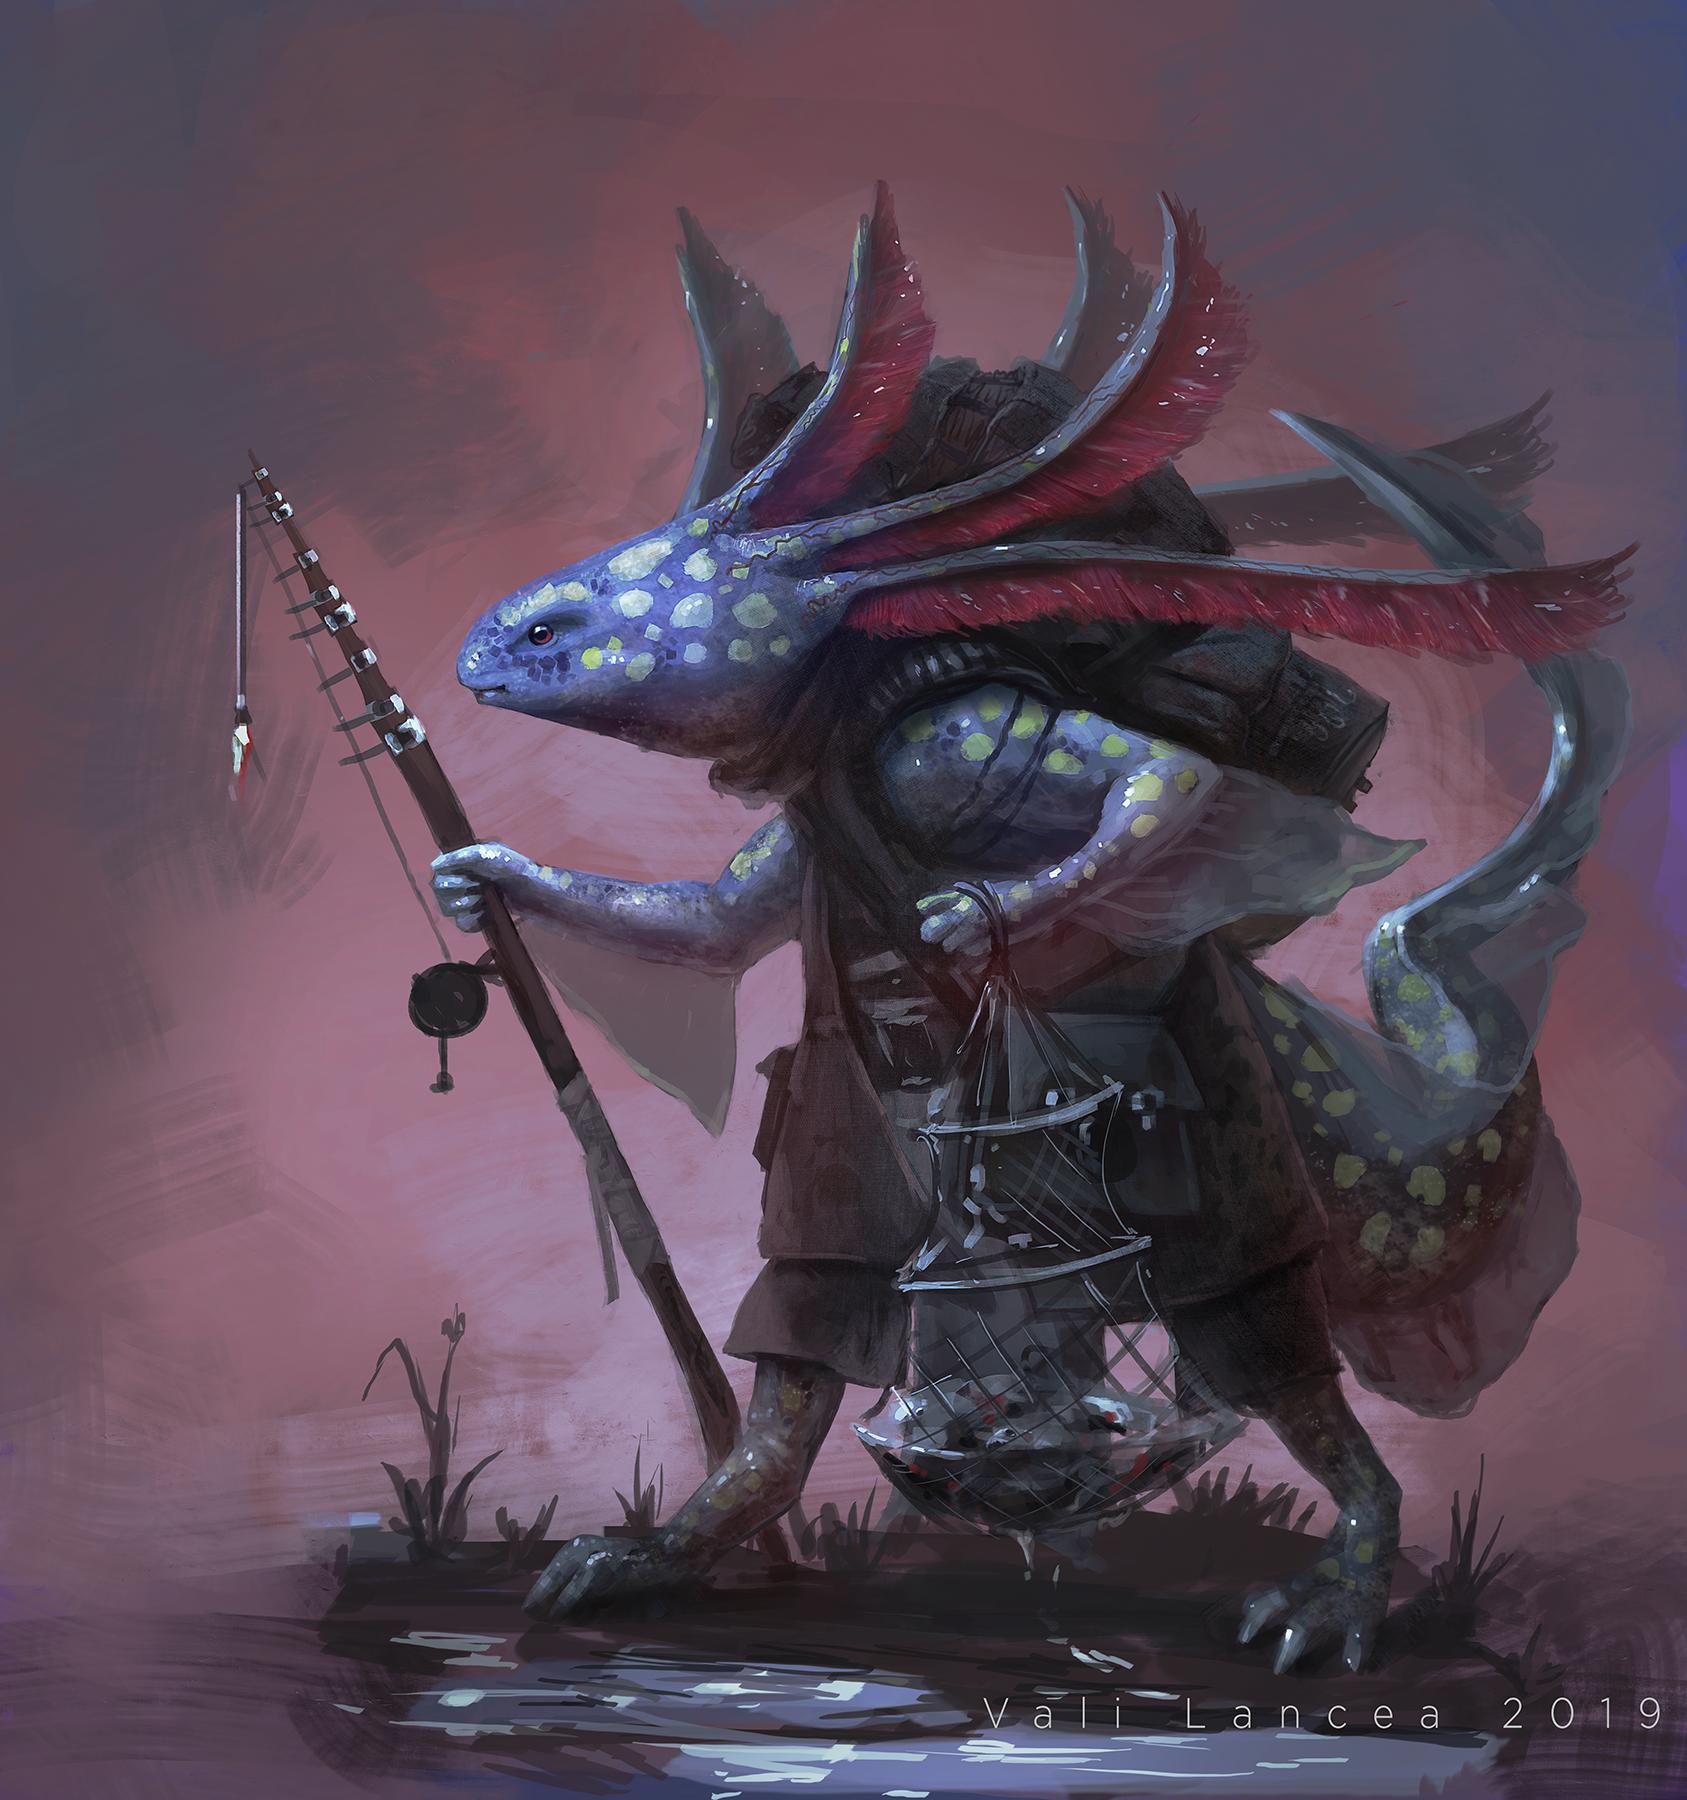 axolotl vali Lancea 2019